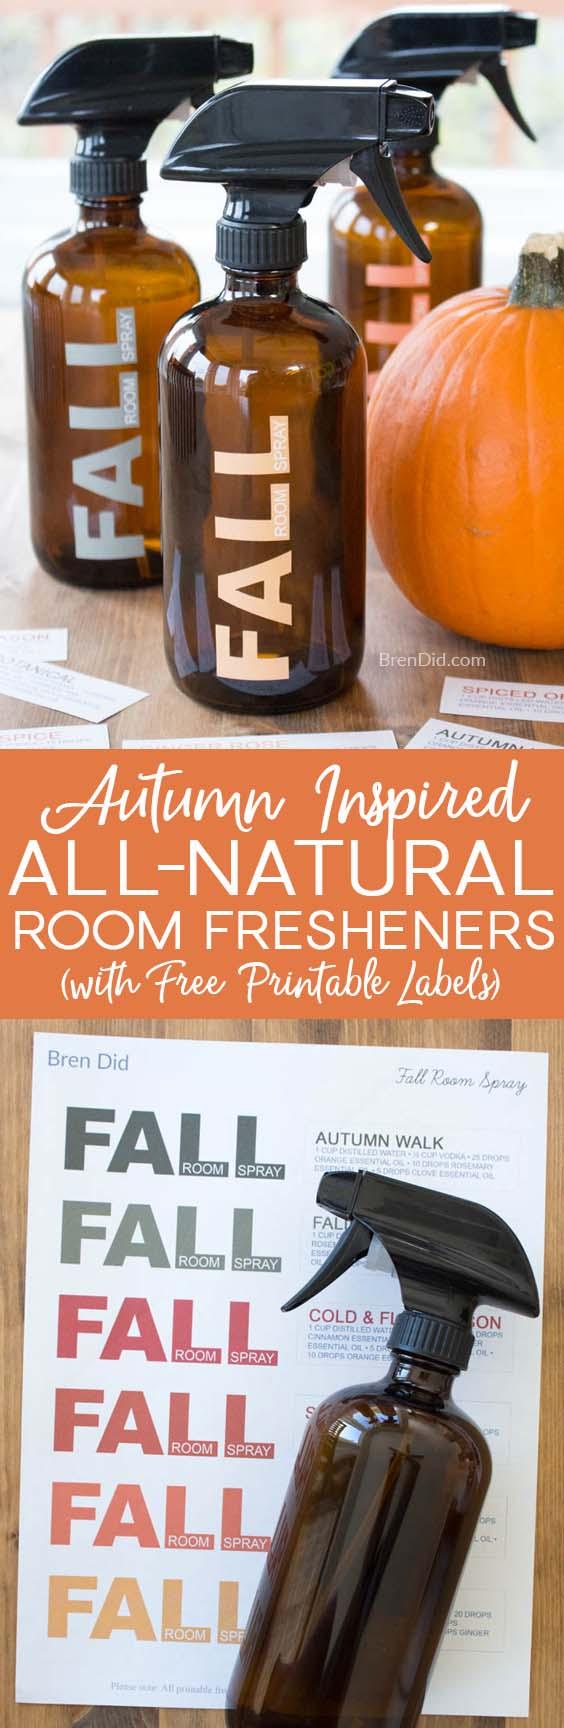 All natural room freshener spray, homemade room refresher spray, DIY air freshener, free printable - Learn to make all-natural room freshener that will leave your home smelling like autumn.